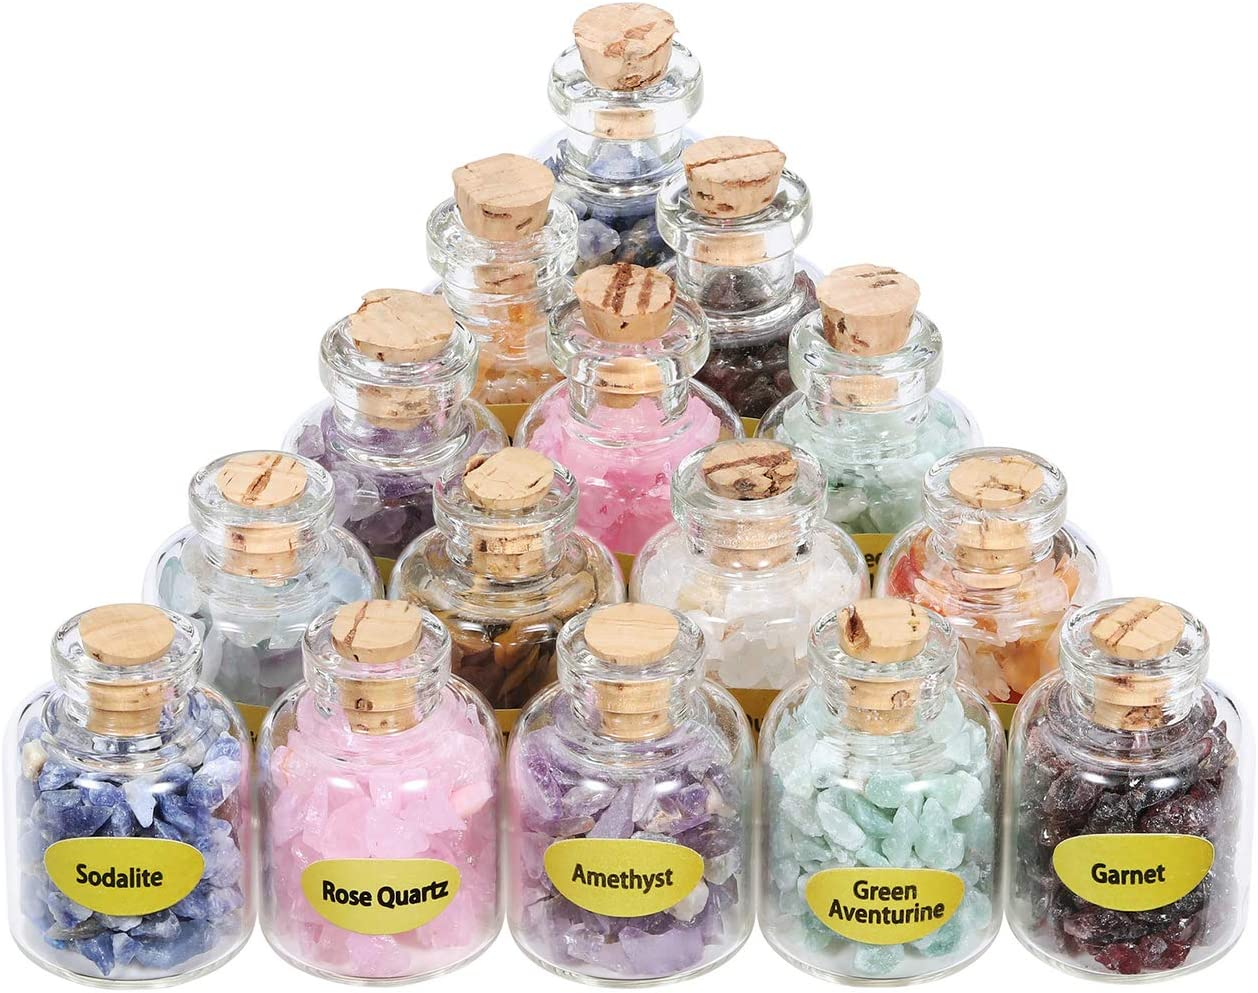 Top Plaza 9 Pcs Healing Crystals and Stones Chips Set Mini Crystal Tumbled Gemstones Bottles for Chakra Reiki Meditation